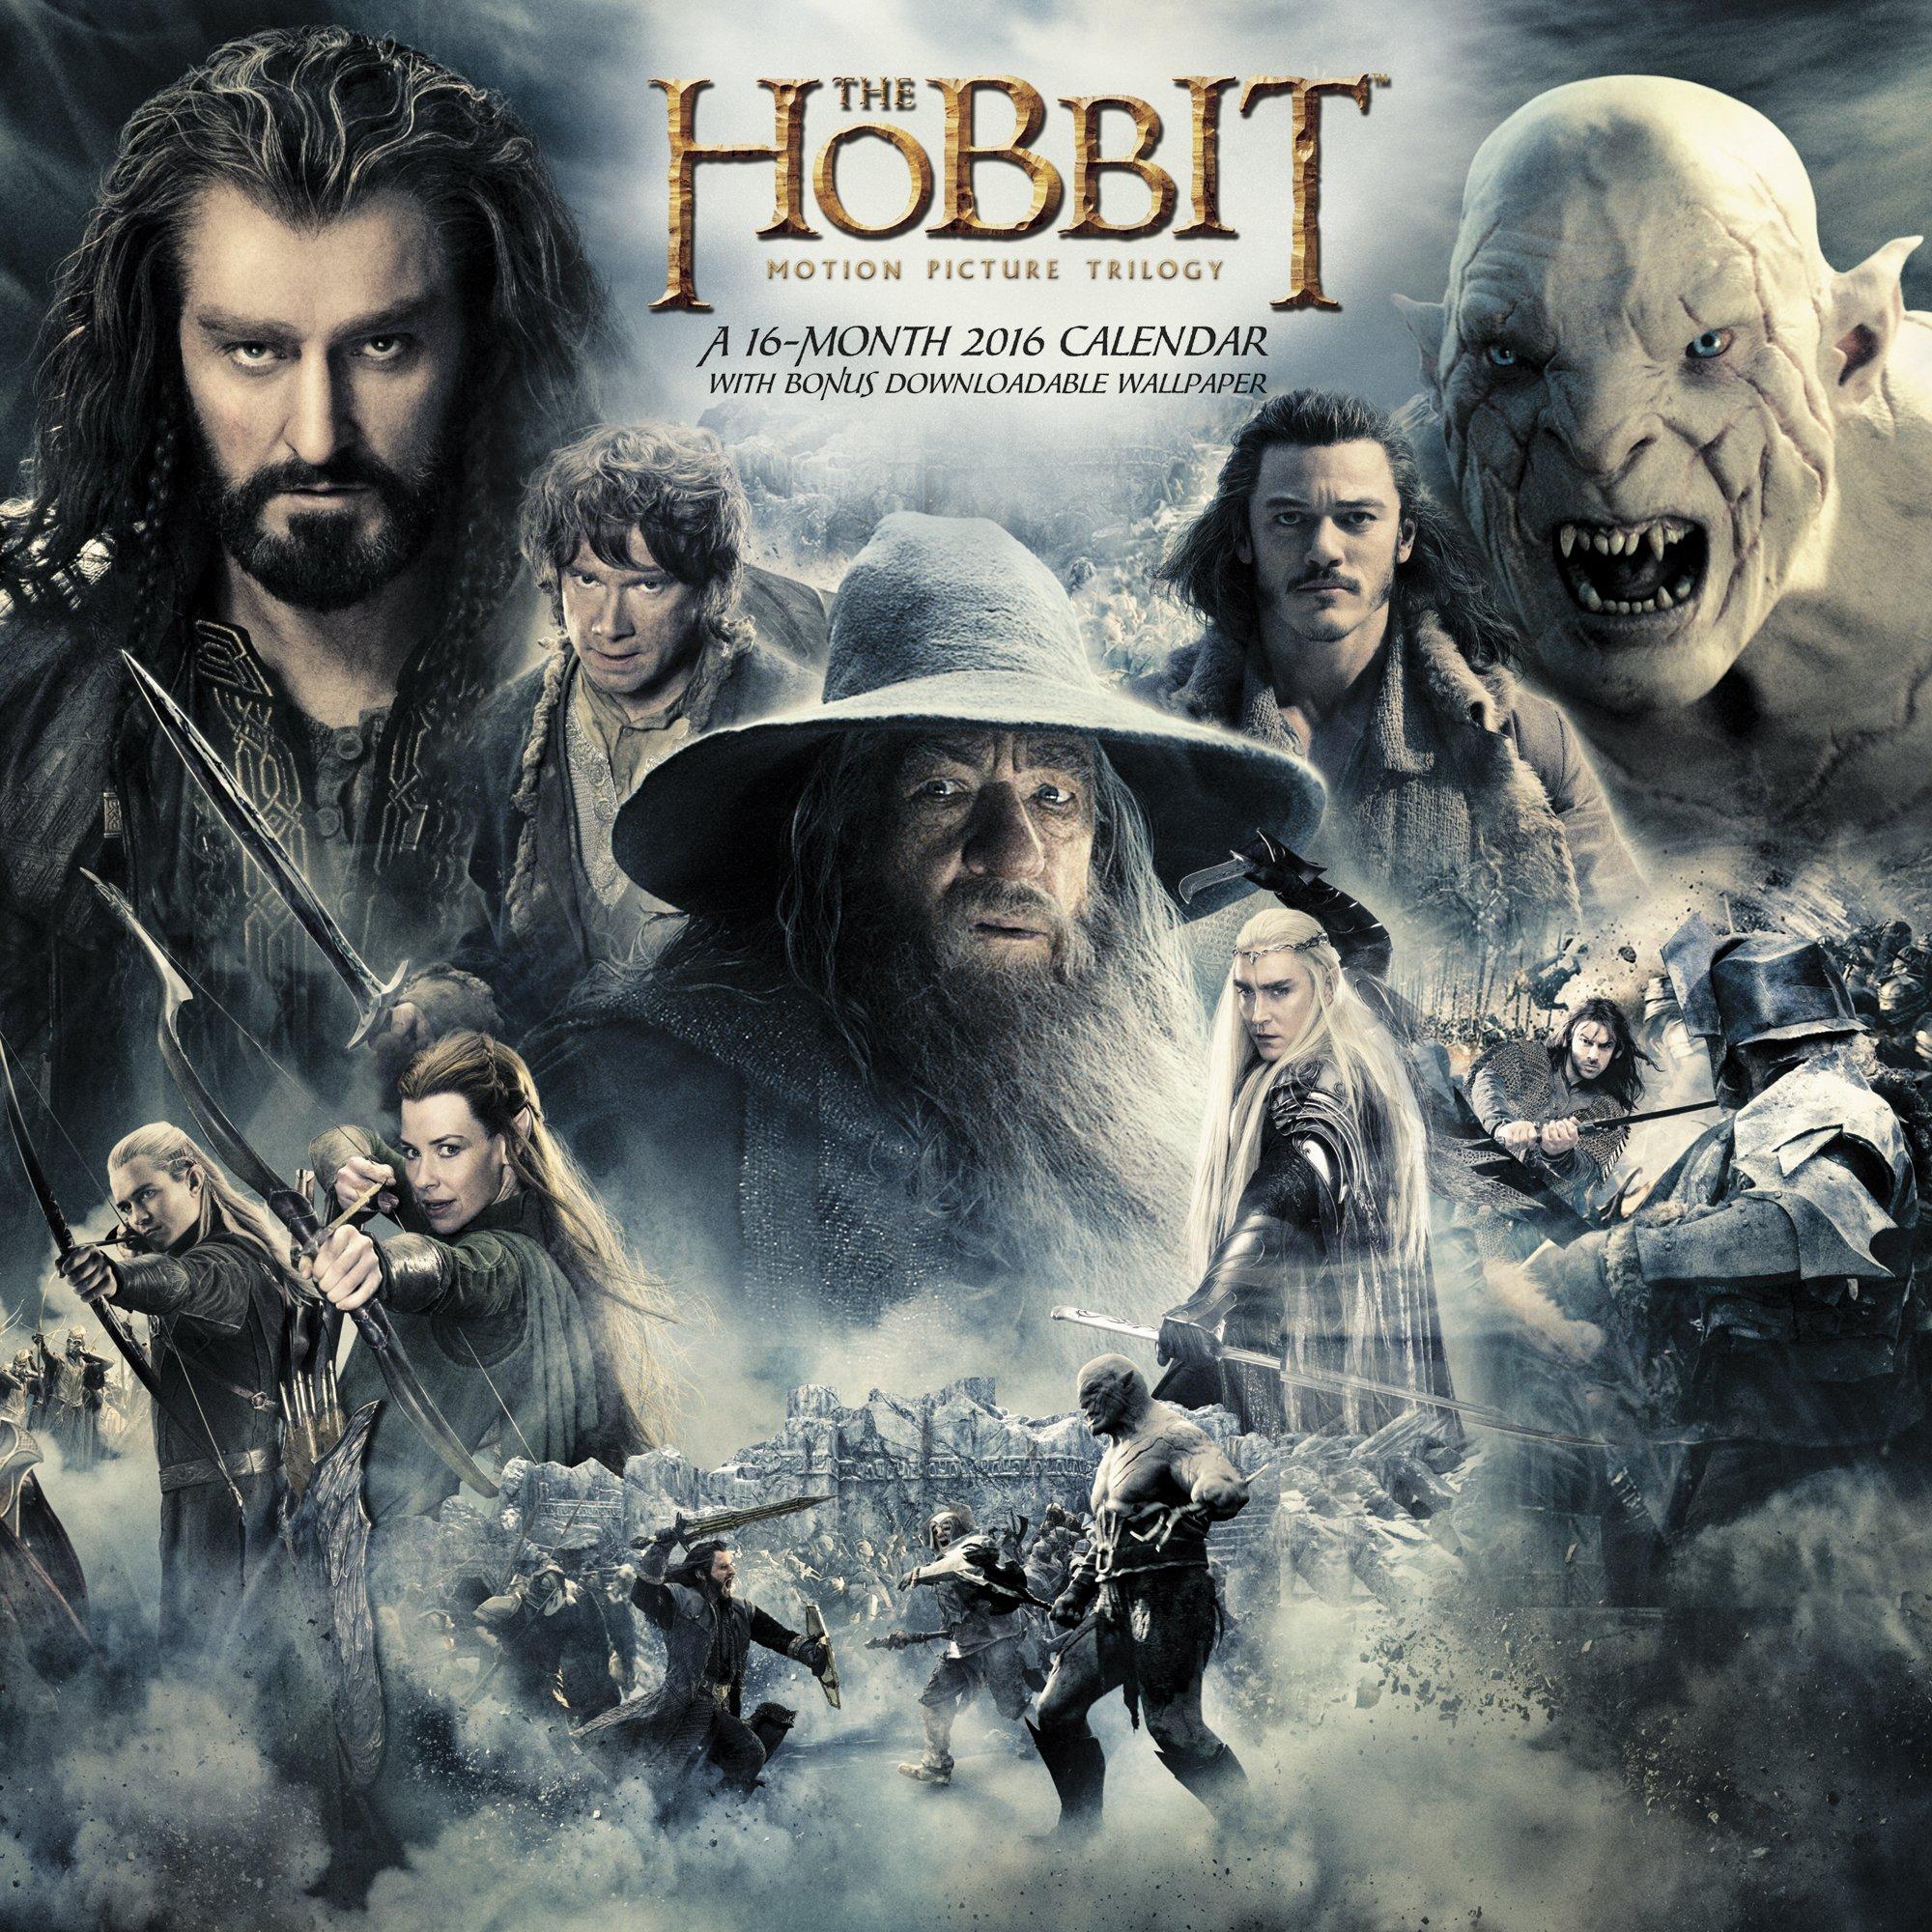 Hobbit Movie Wall Calendar 2017